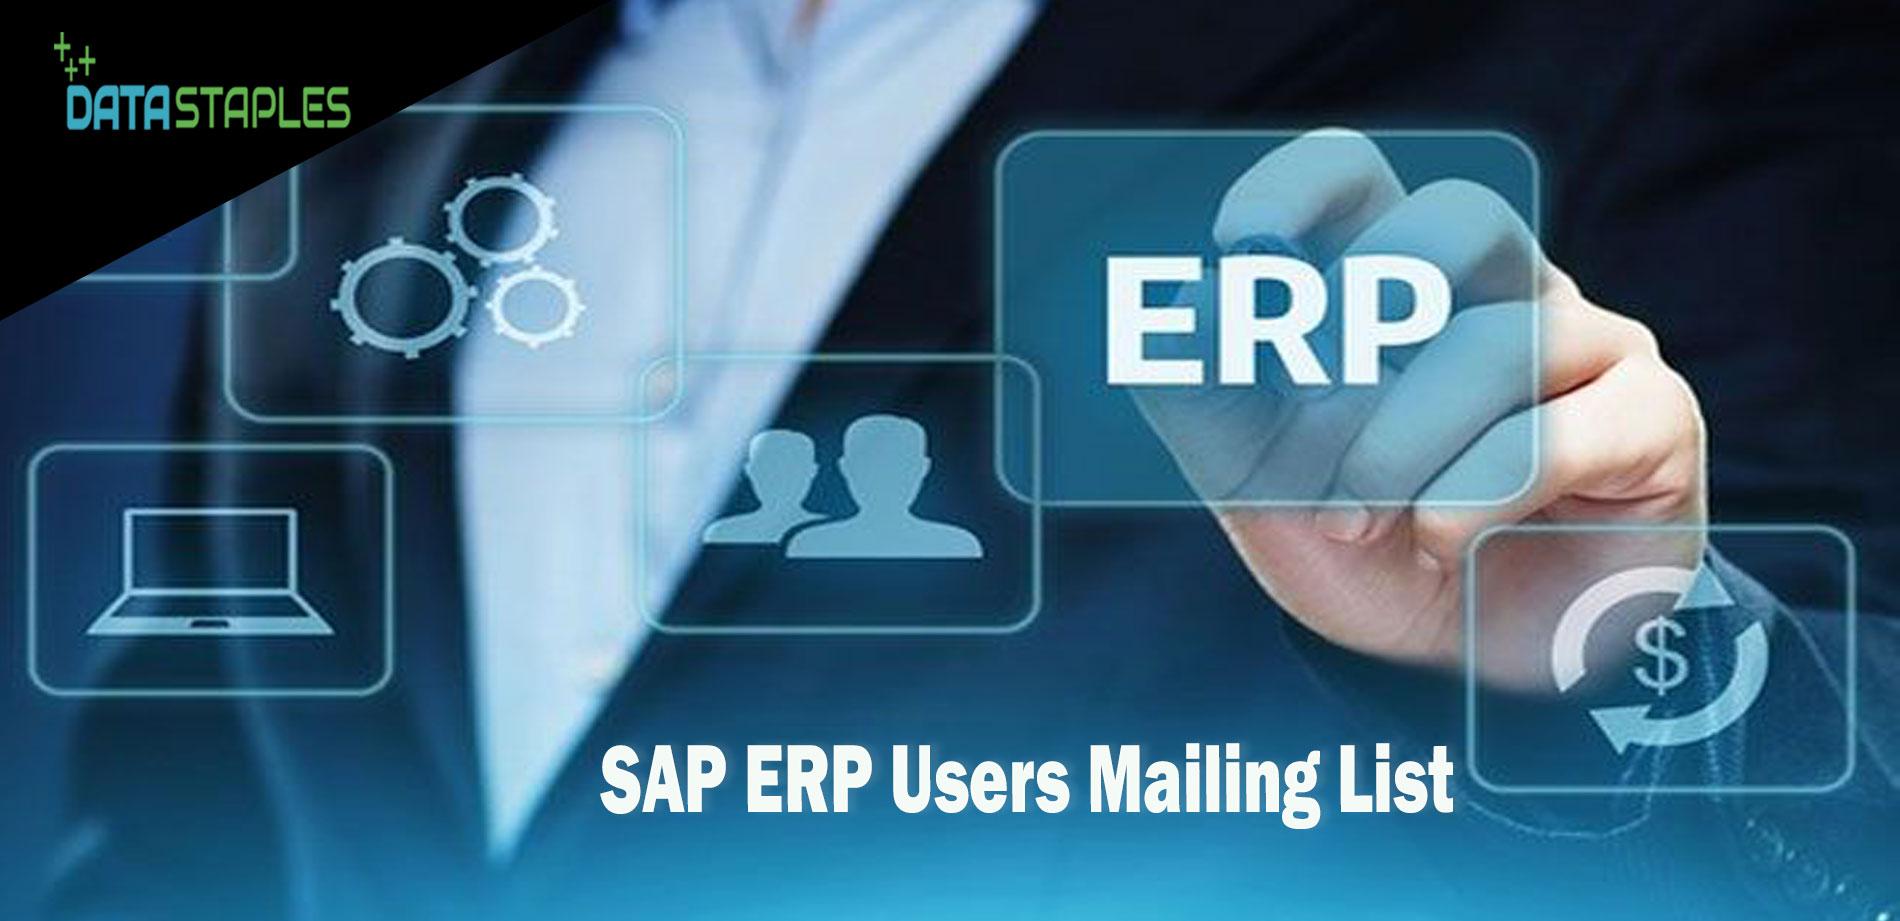 SAP ERP Users Mailing List | DataStaples